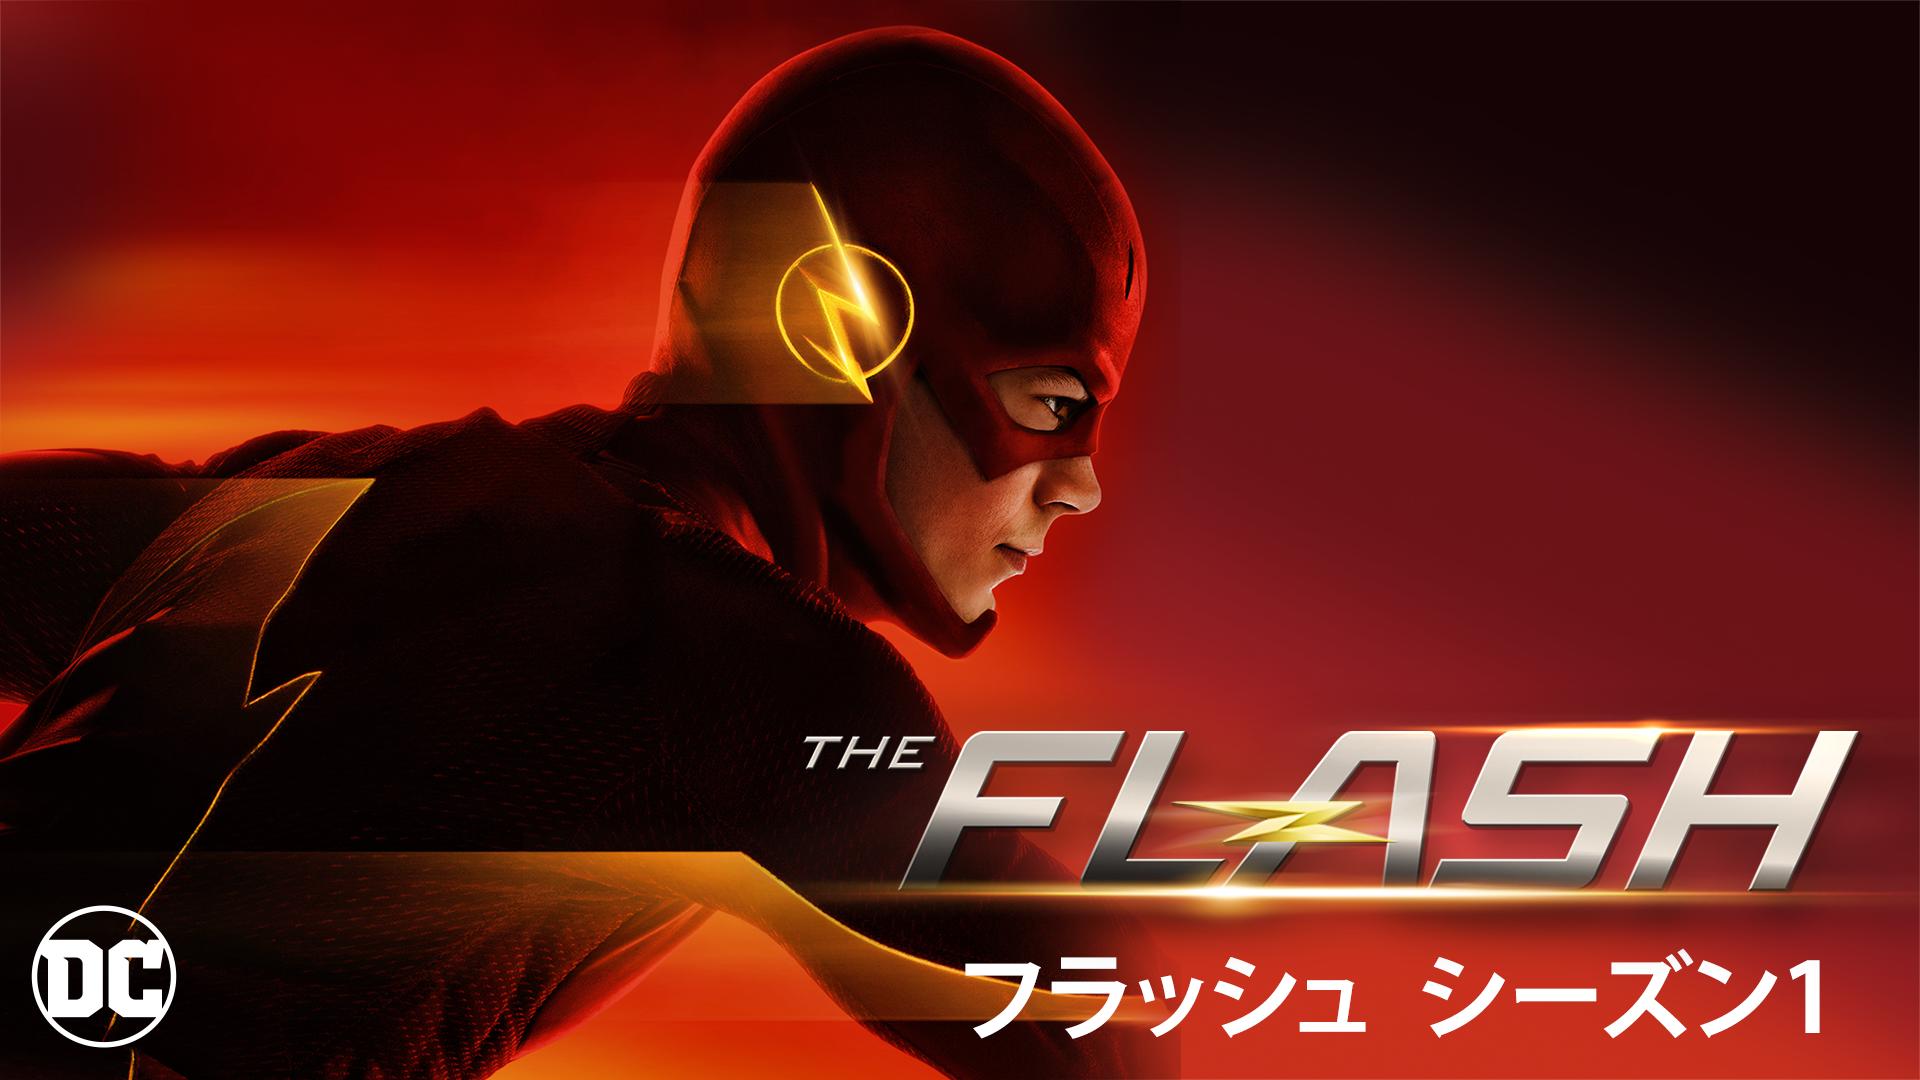 THE FLASH/フラッシュ シーズン1